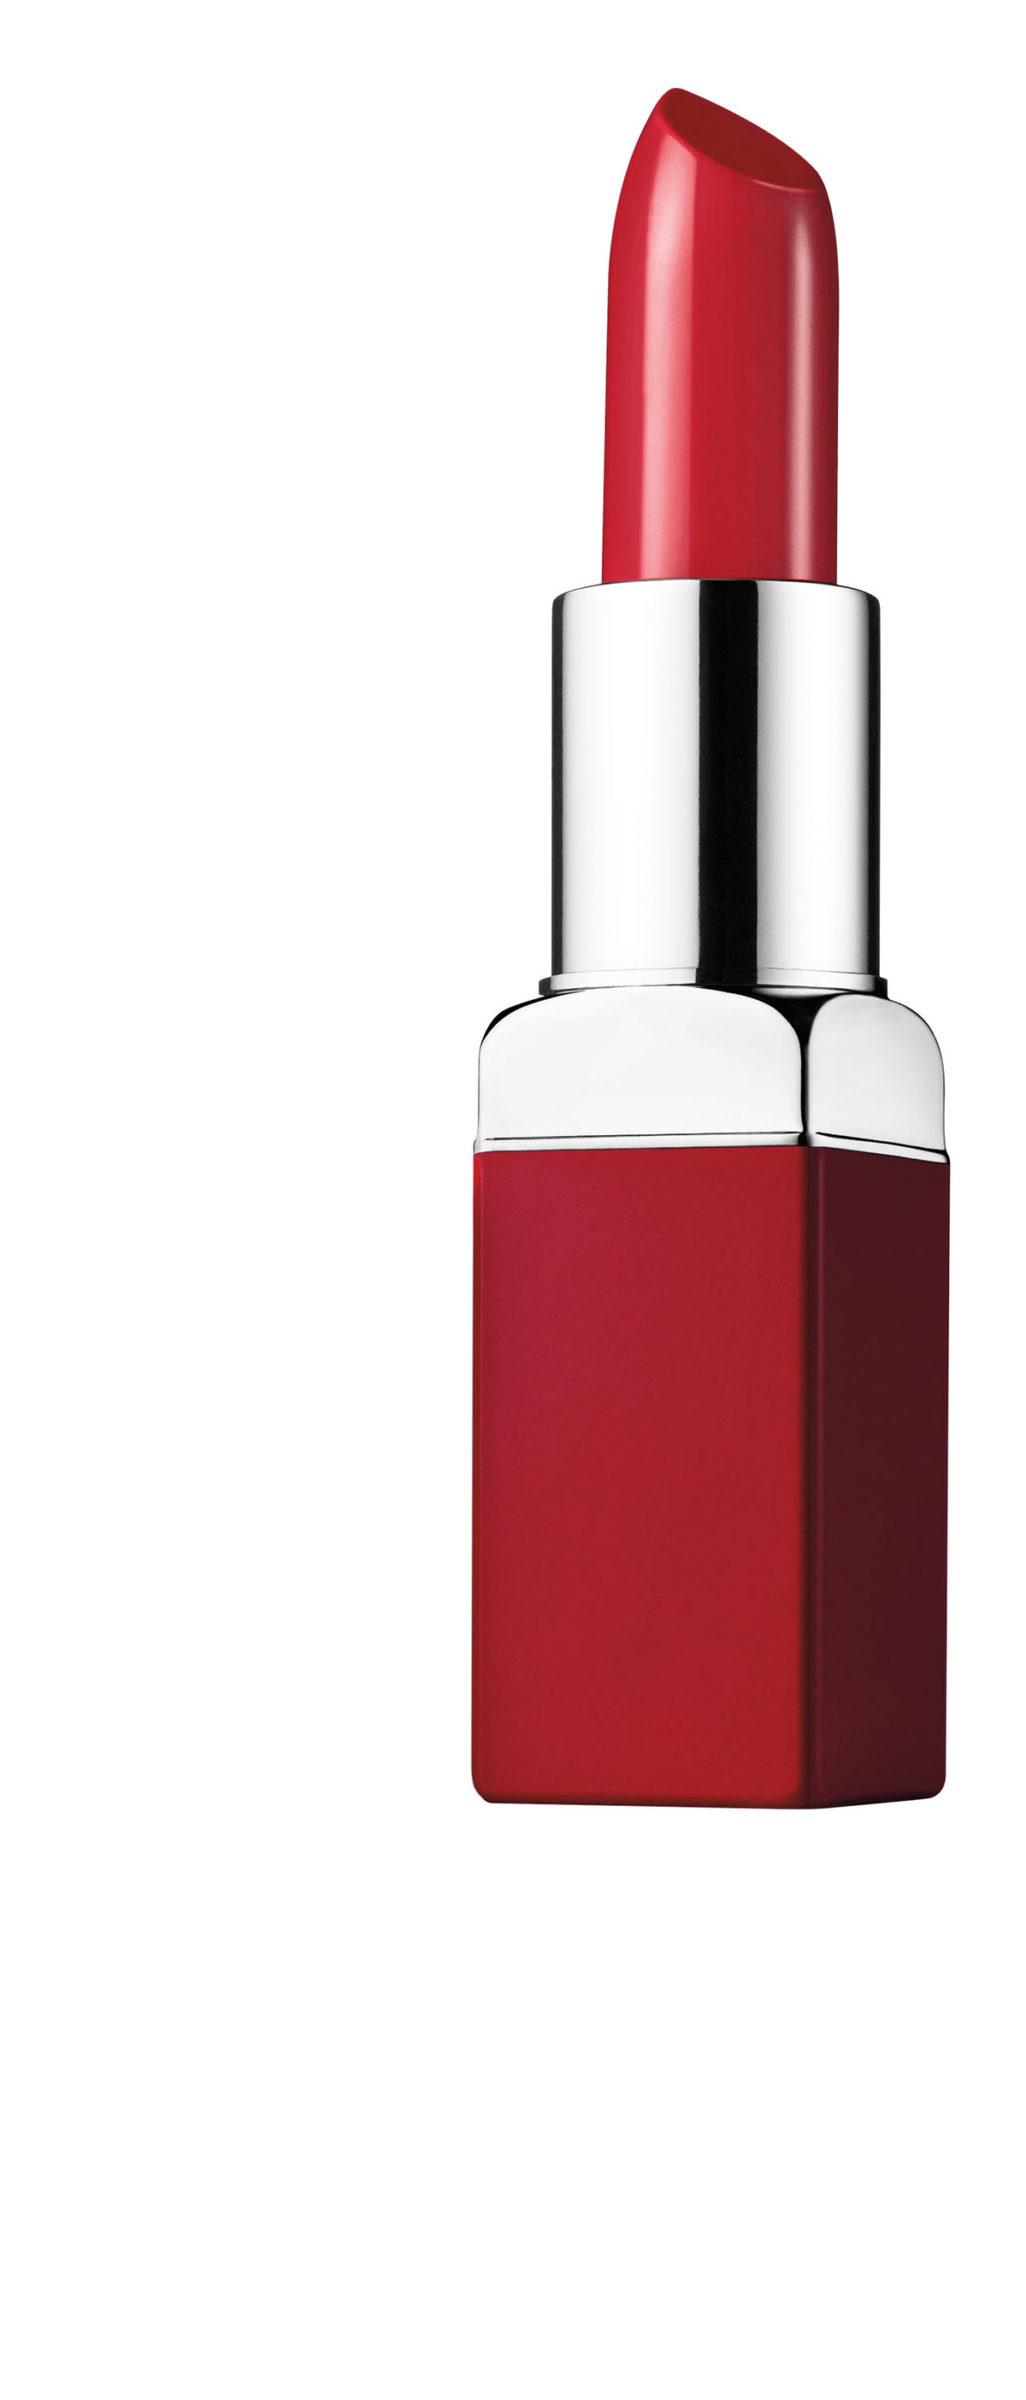 FFW seleciona produtos para a nécessaire de beleza do ...